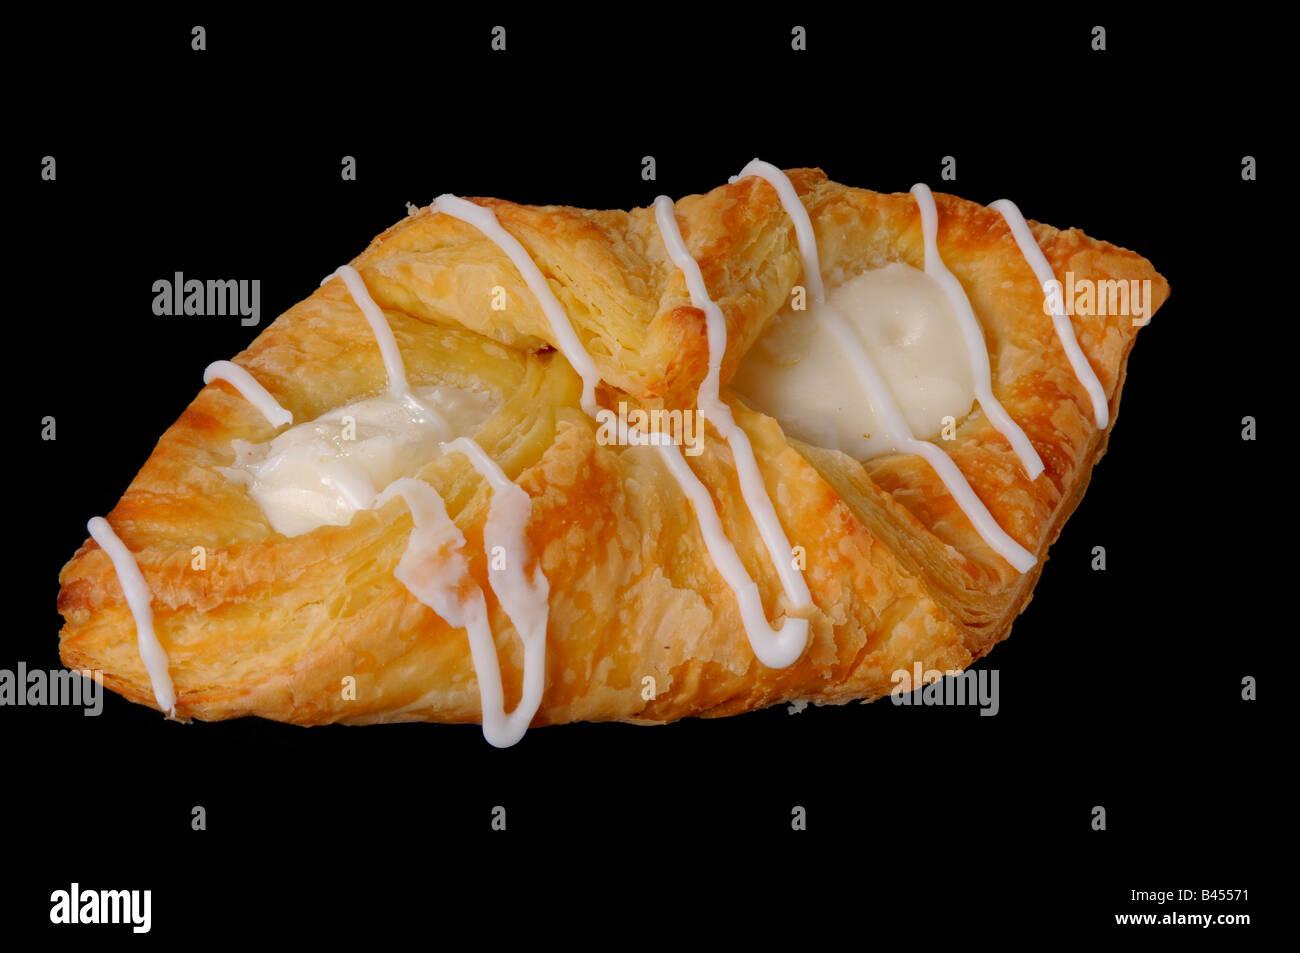 Cream cheese danish pastry isolate on black - Stock Image